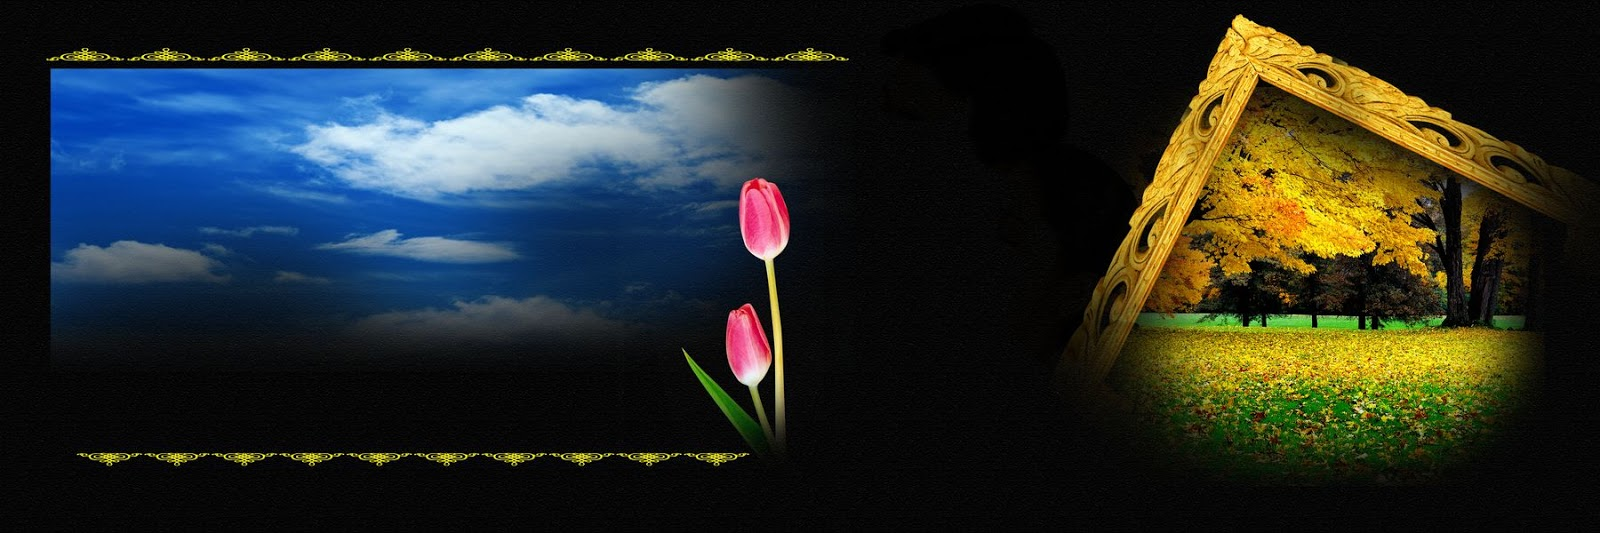 Karizma album hd joy studio design gallery best design - 8x24 Glorious Designing